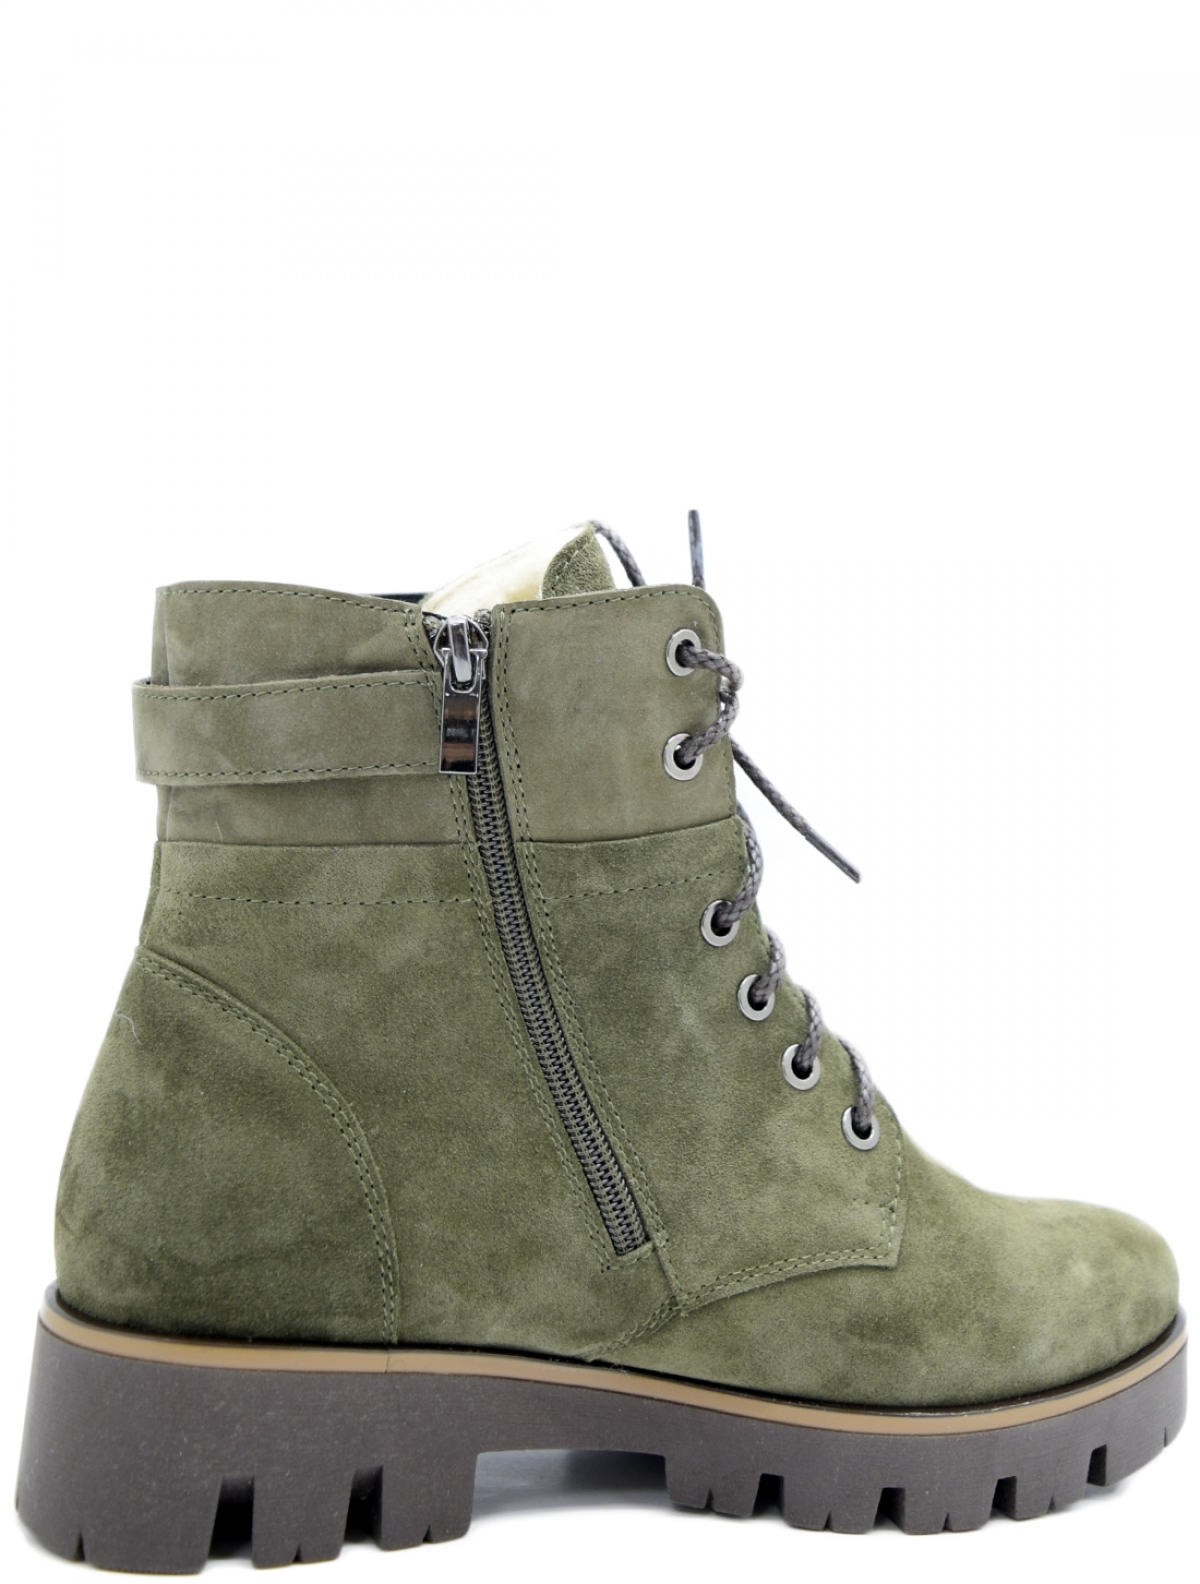 Selm 1965-64/56 женские ботинки